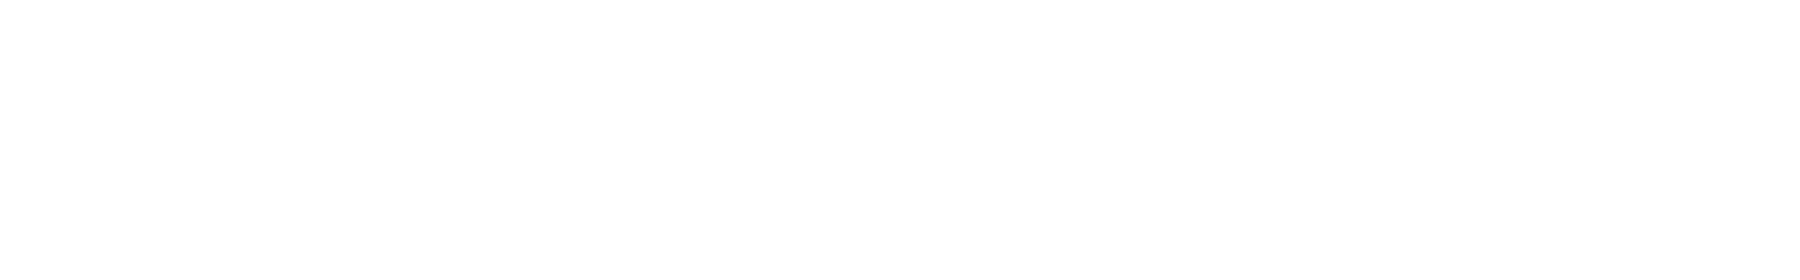 mc09 acid bassline03 130 gmaj